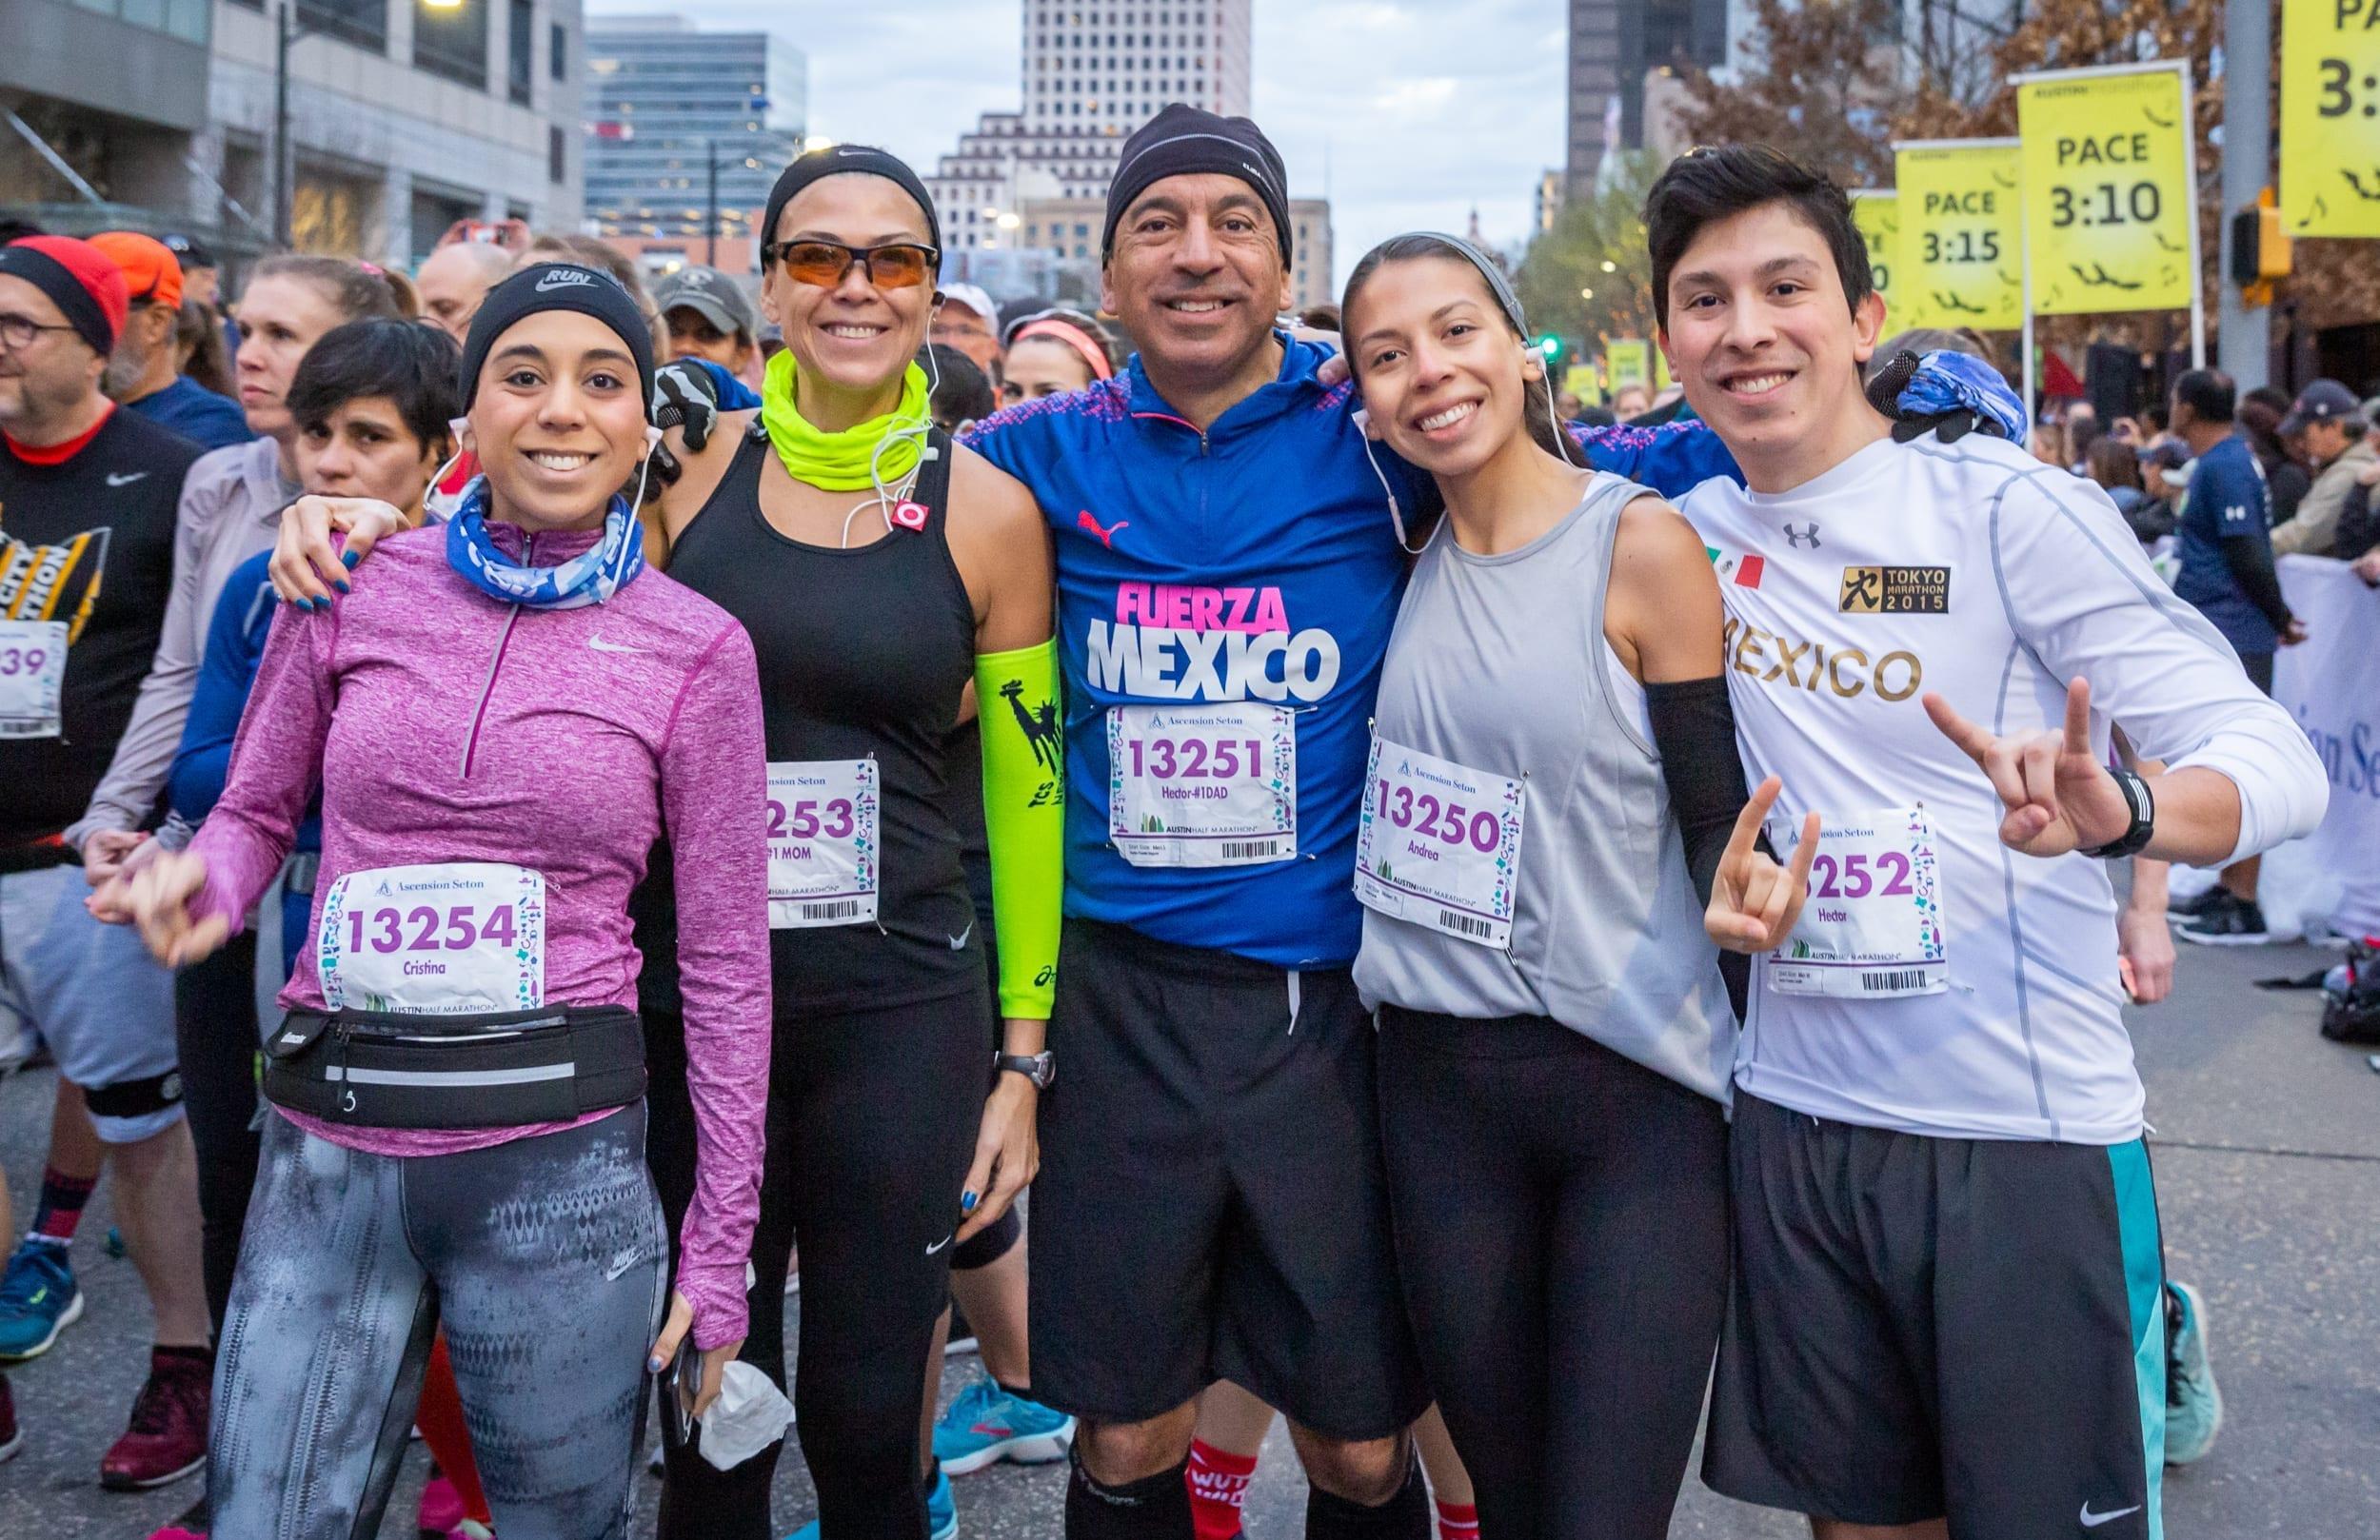 Group photo of friends before running the 2019 Austin Half Marathon. Running with friends is a great beginning running tip.